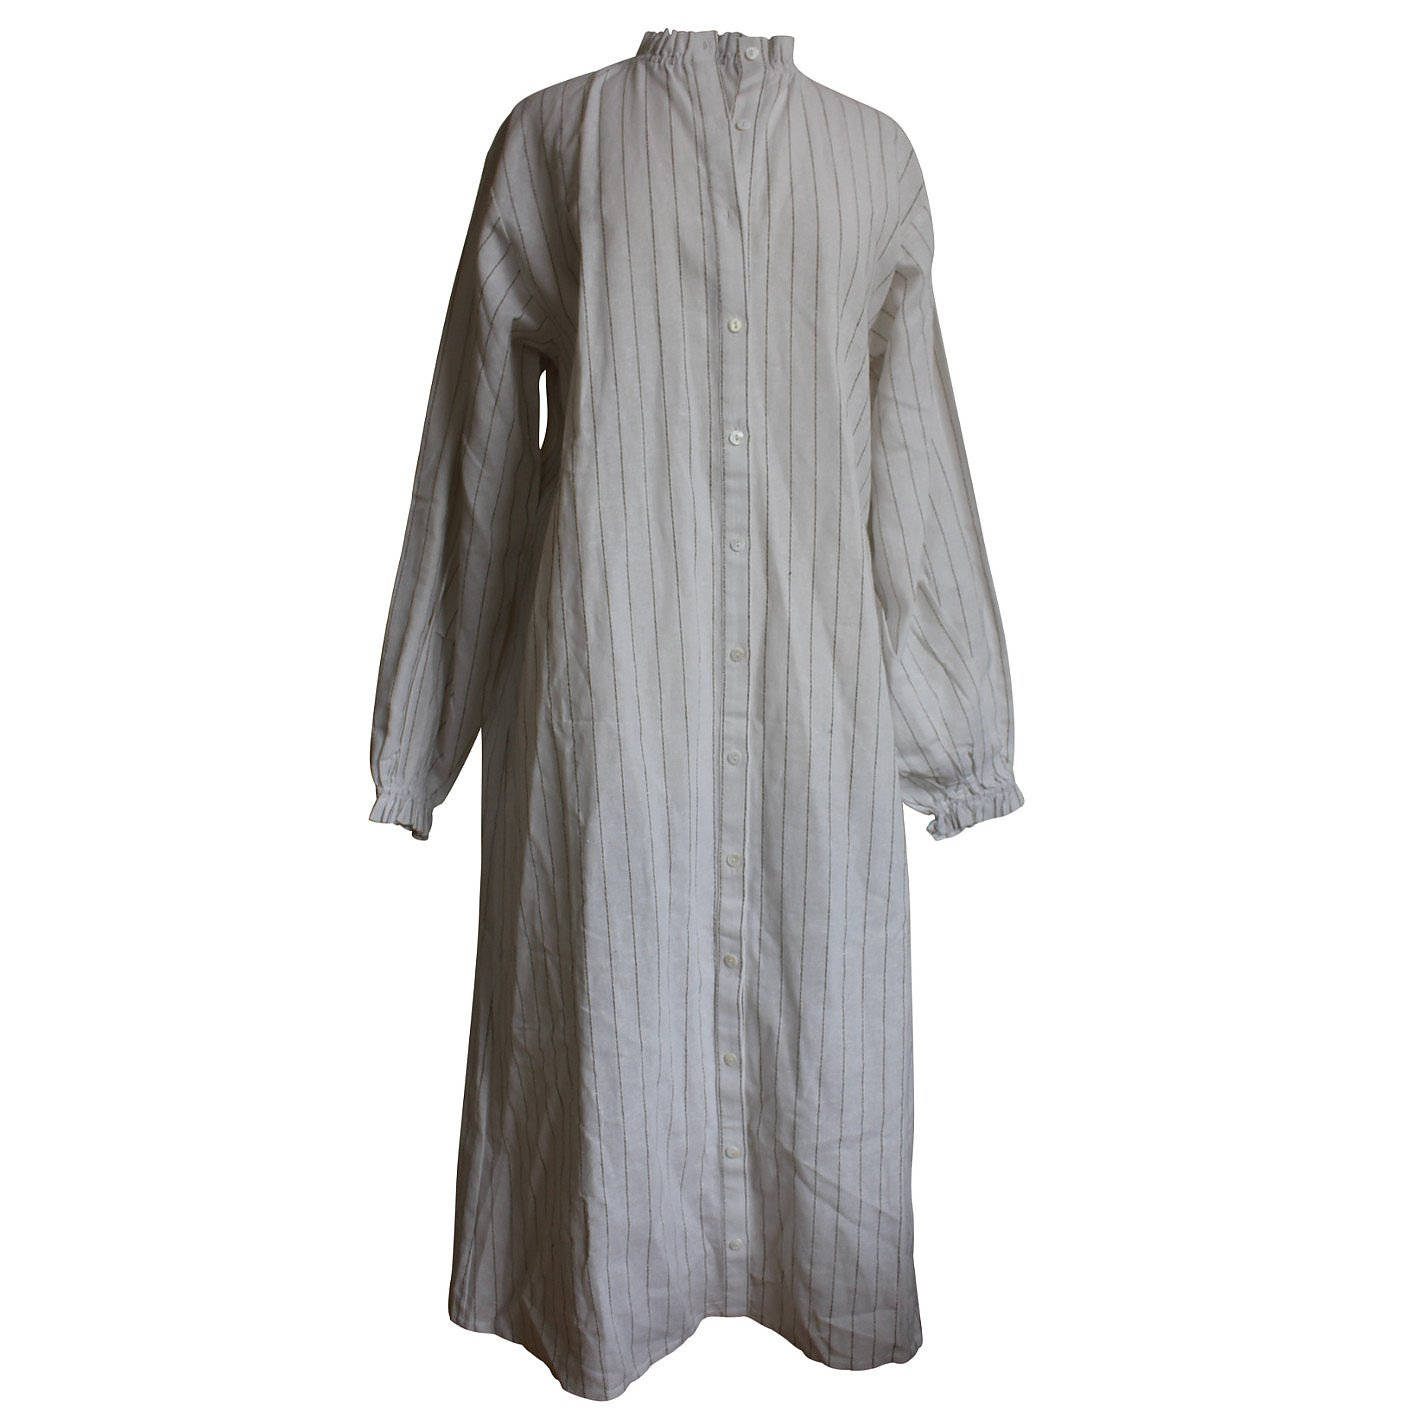 Boutique Ruffled Striped Shirt Dress